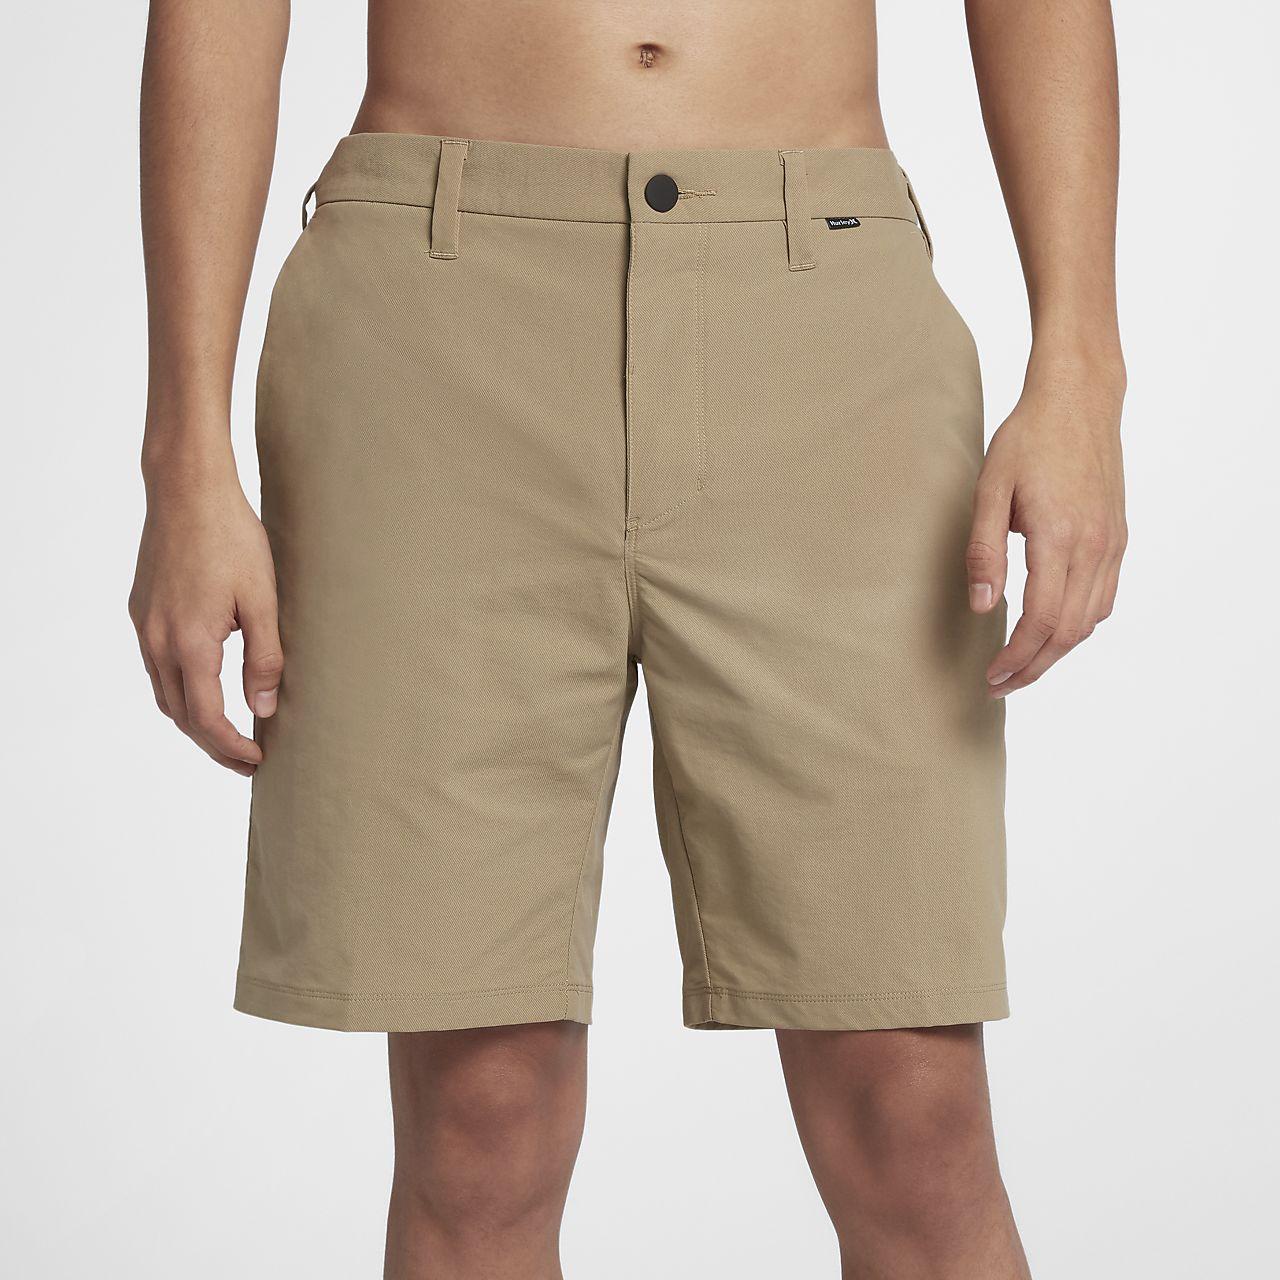 "Shorts 19"" Hurley Dri-FIT Chino - Uomo"